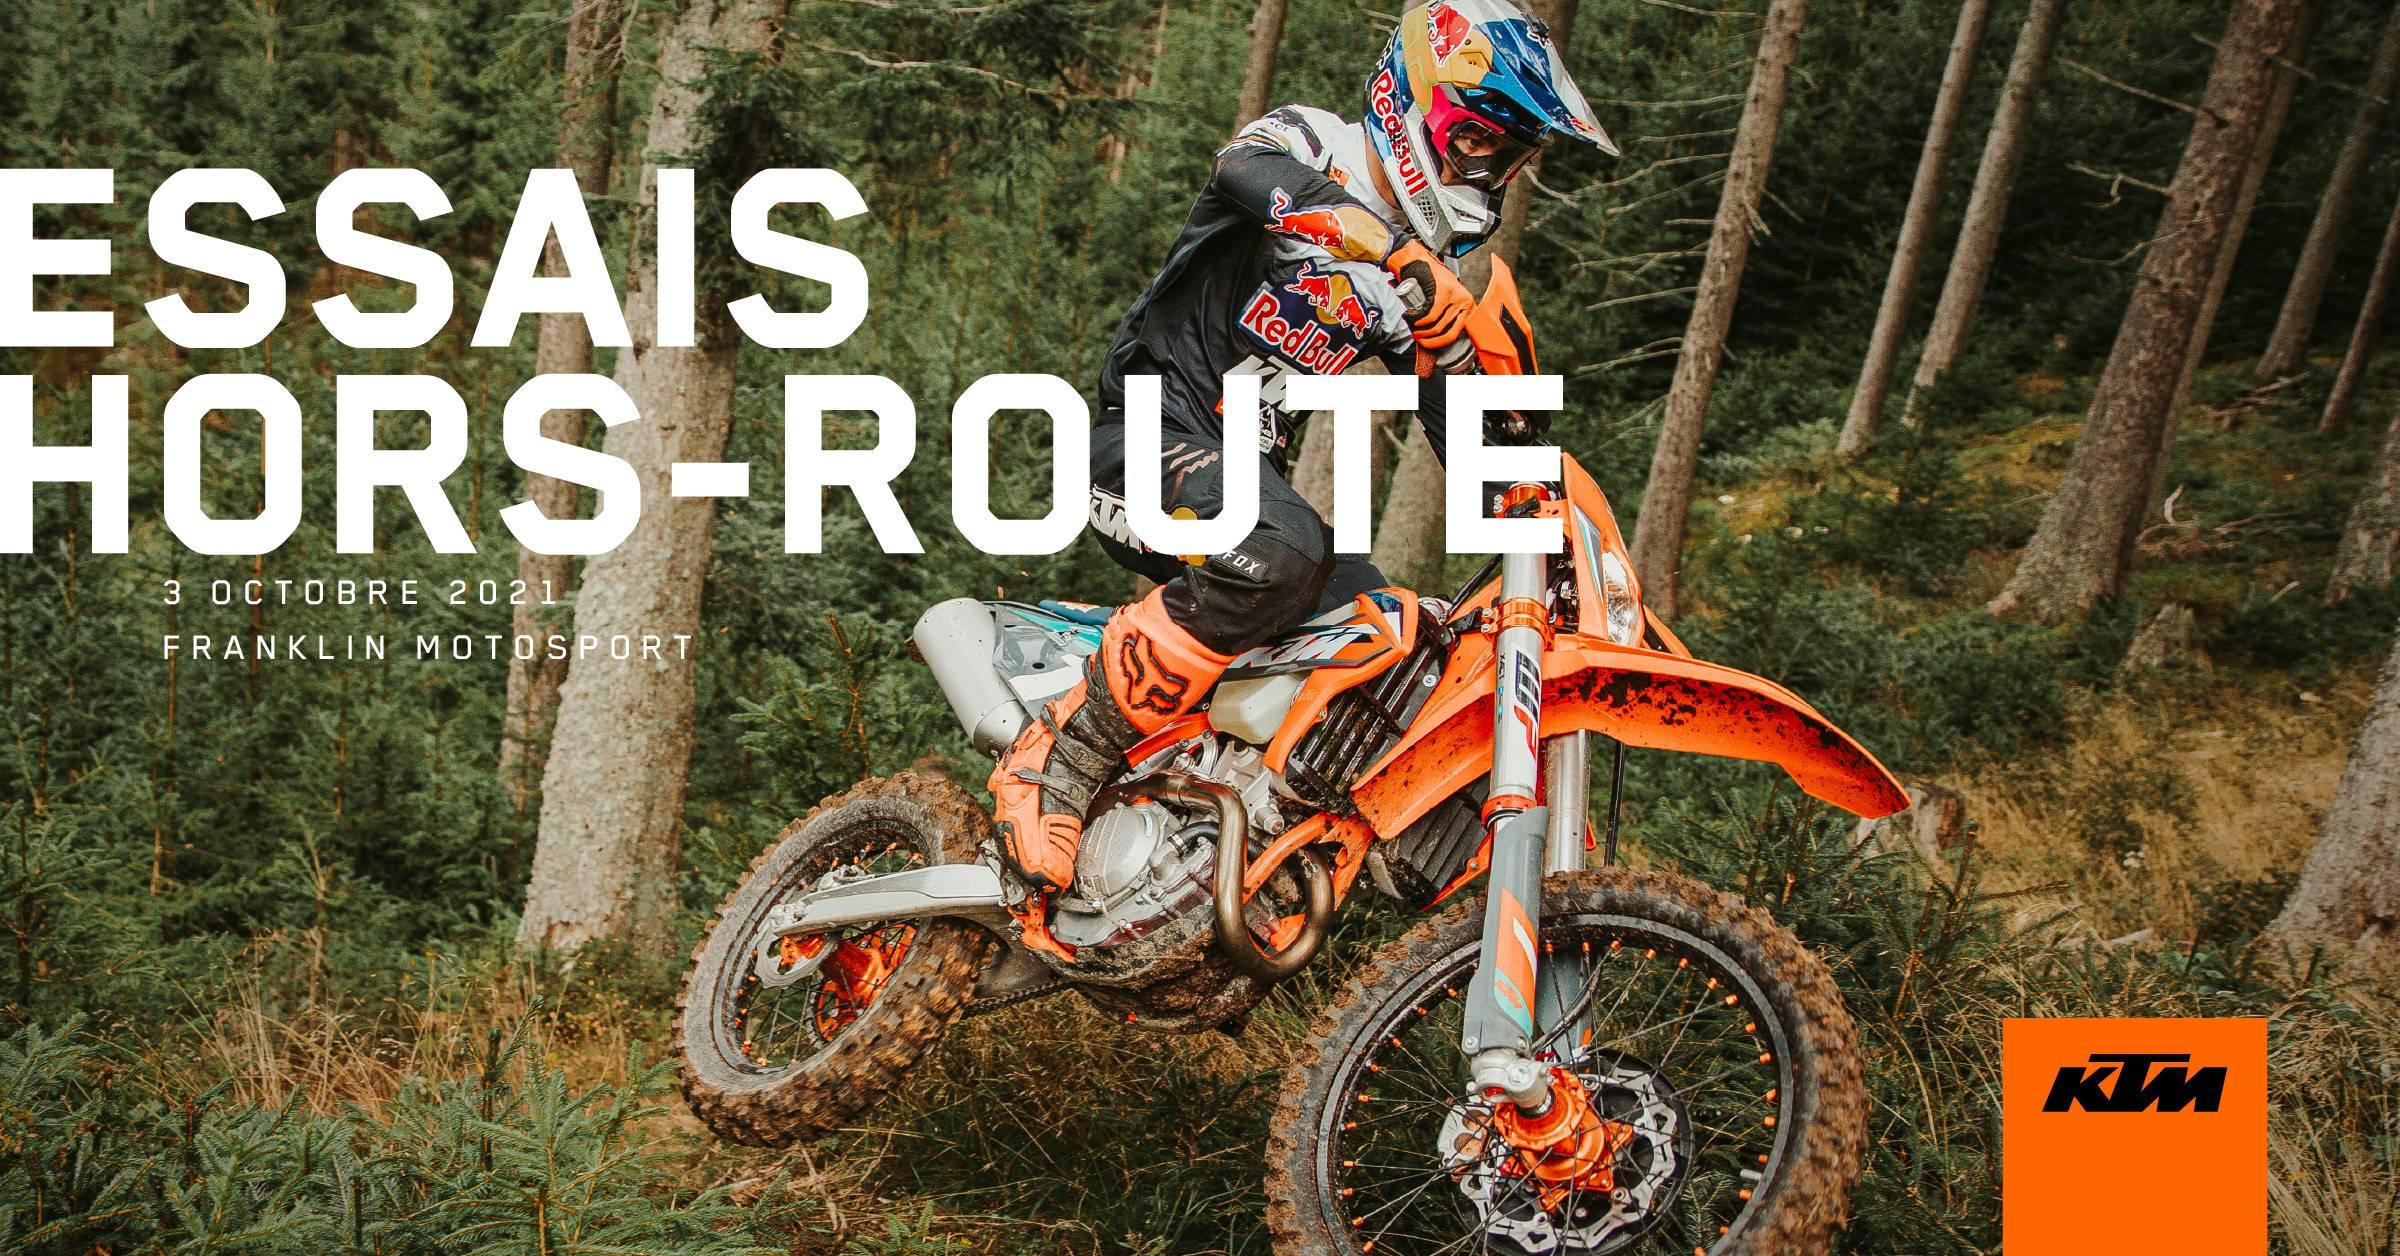 3 octobre 2021 - Essais hors-route KTM